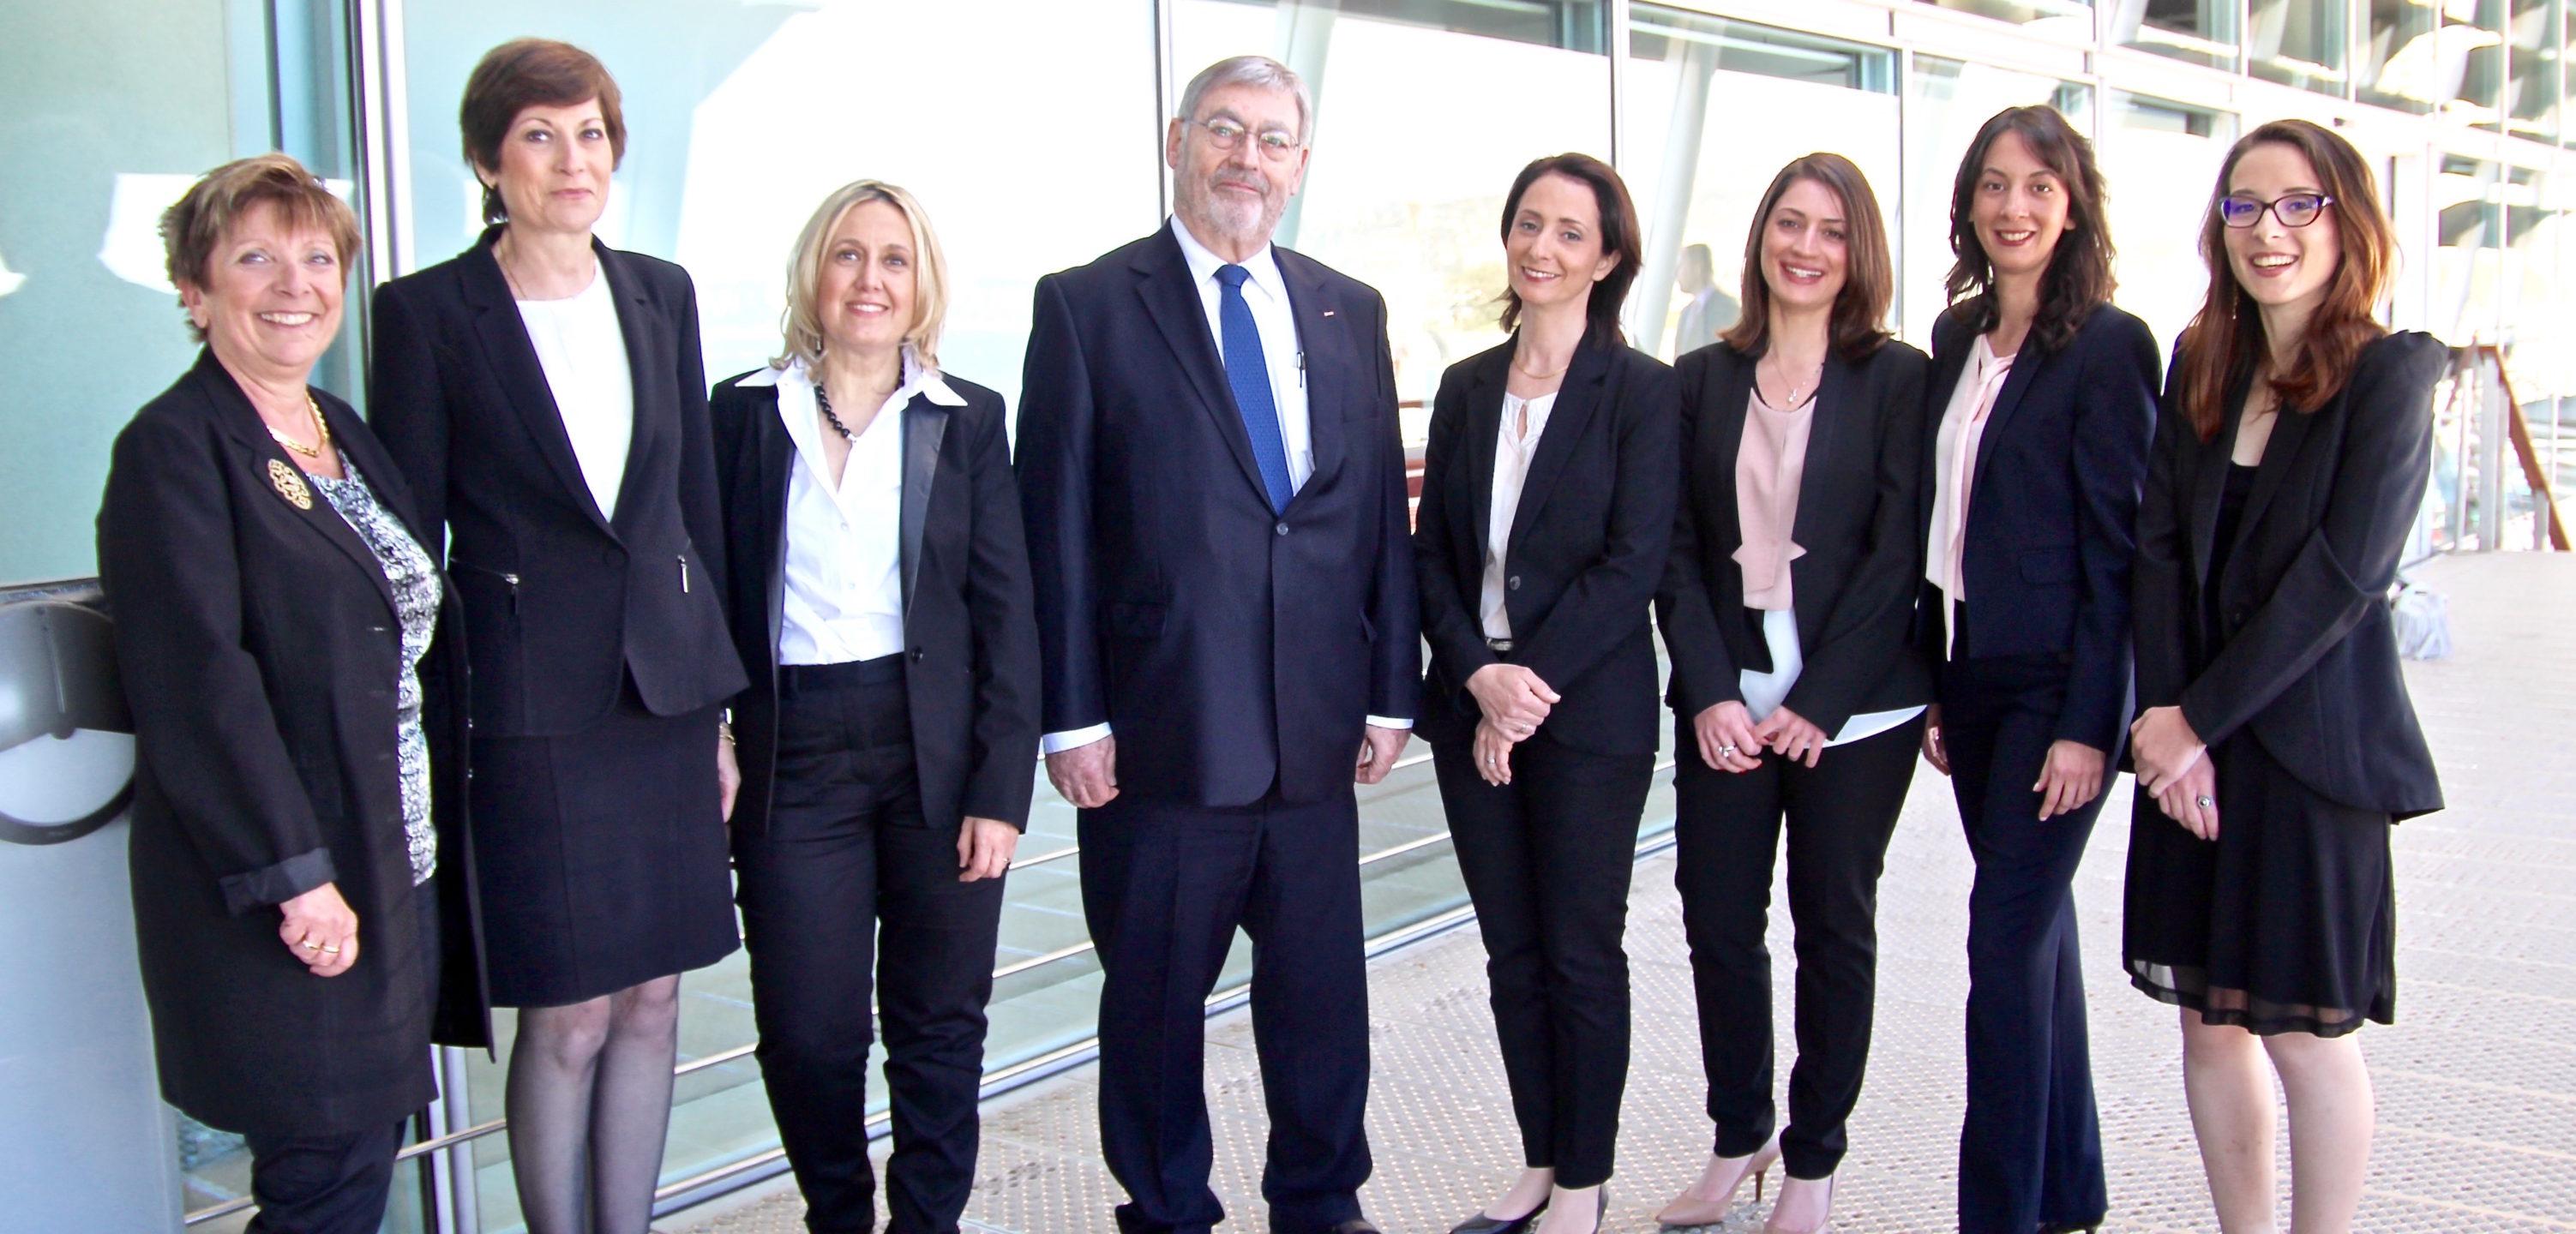 Équipe Billon Conseil & Services